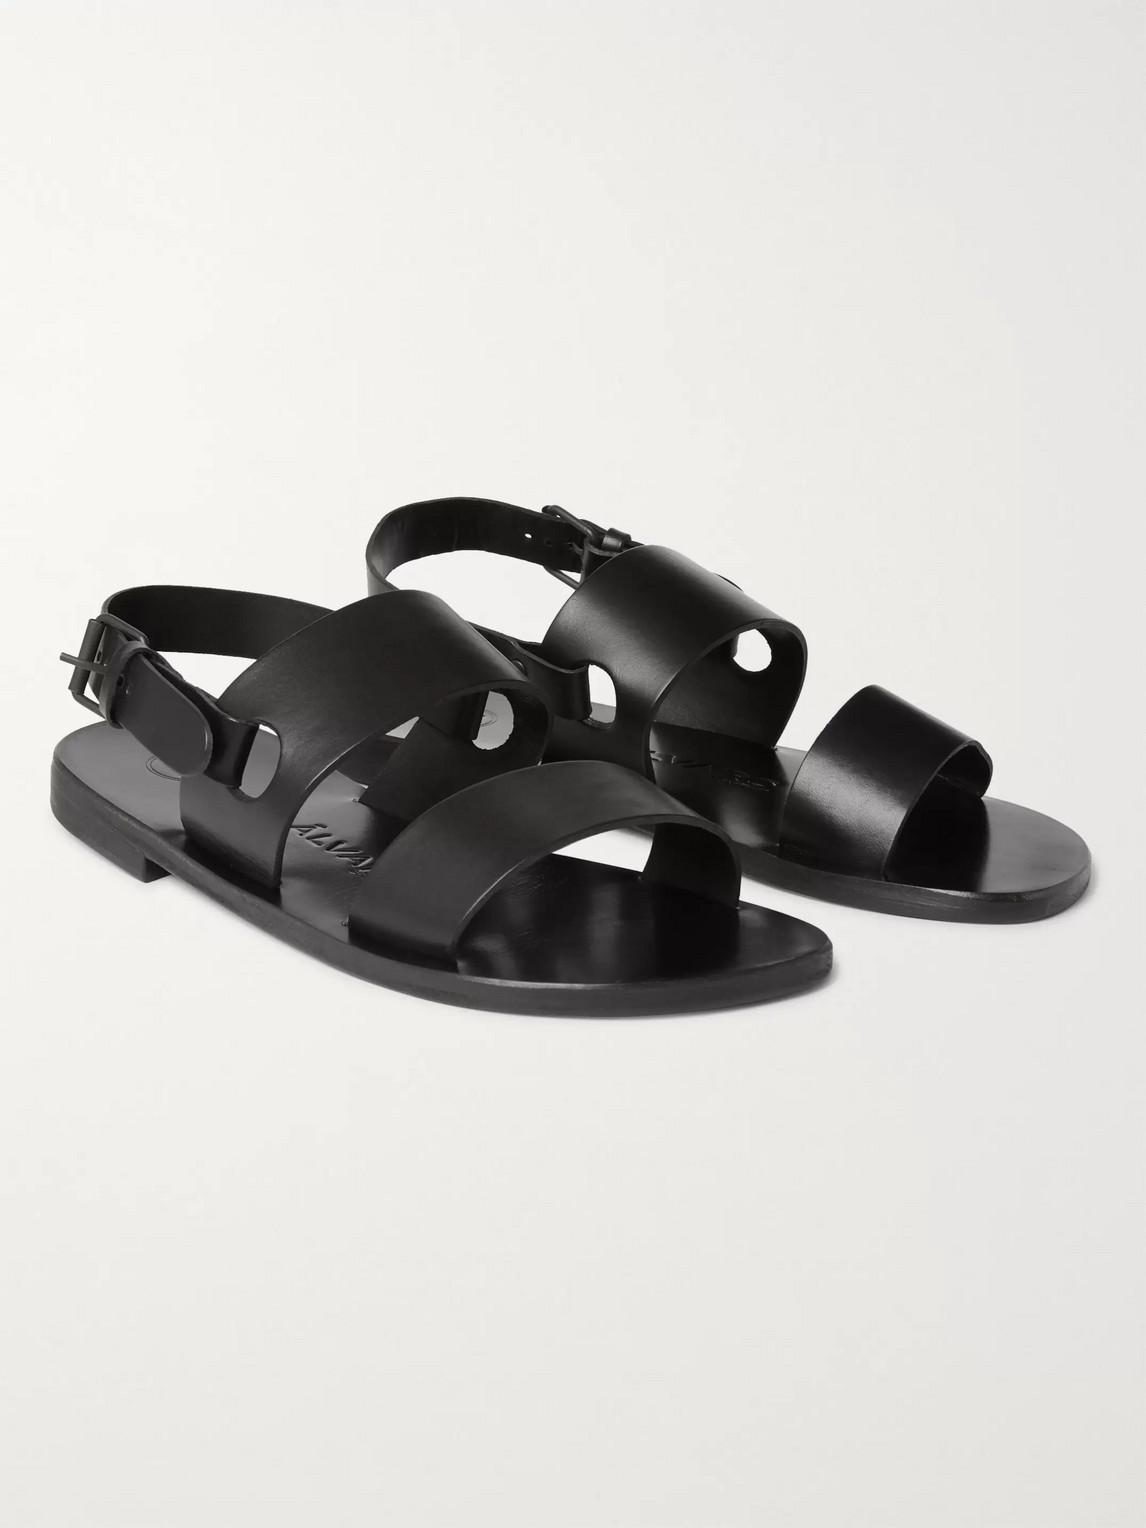 álvaro - alexander leather sandals - men - black